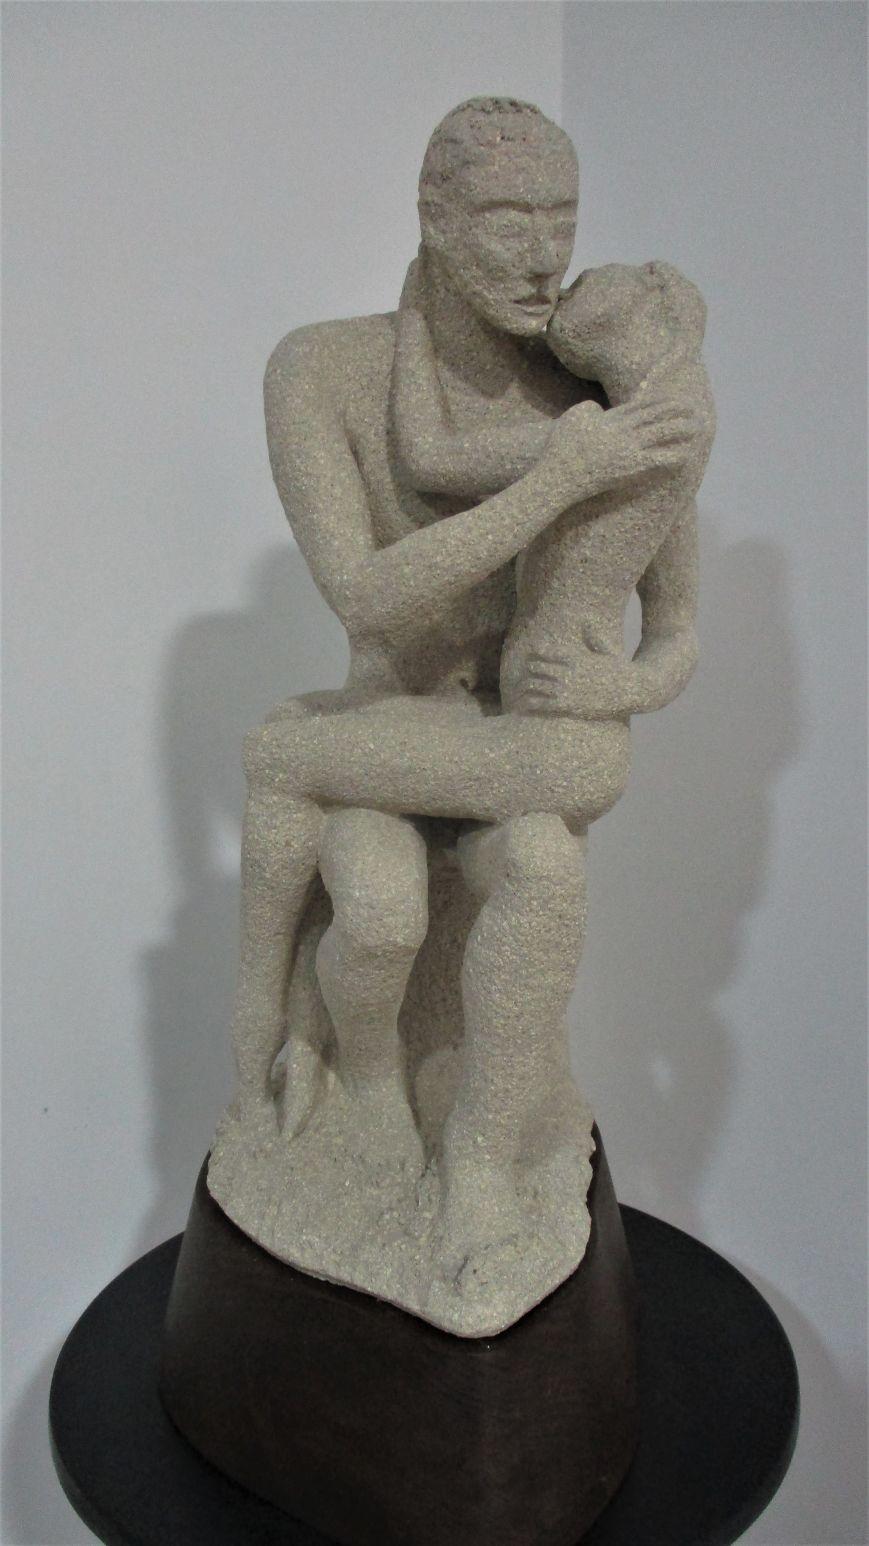 """SUSURRO"" (2019) - María Cristina Sánchez Estévez - Cristina Sánchez"